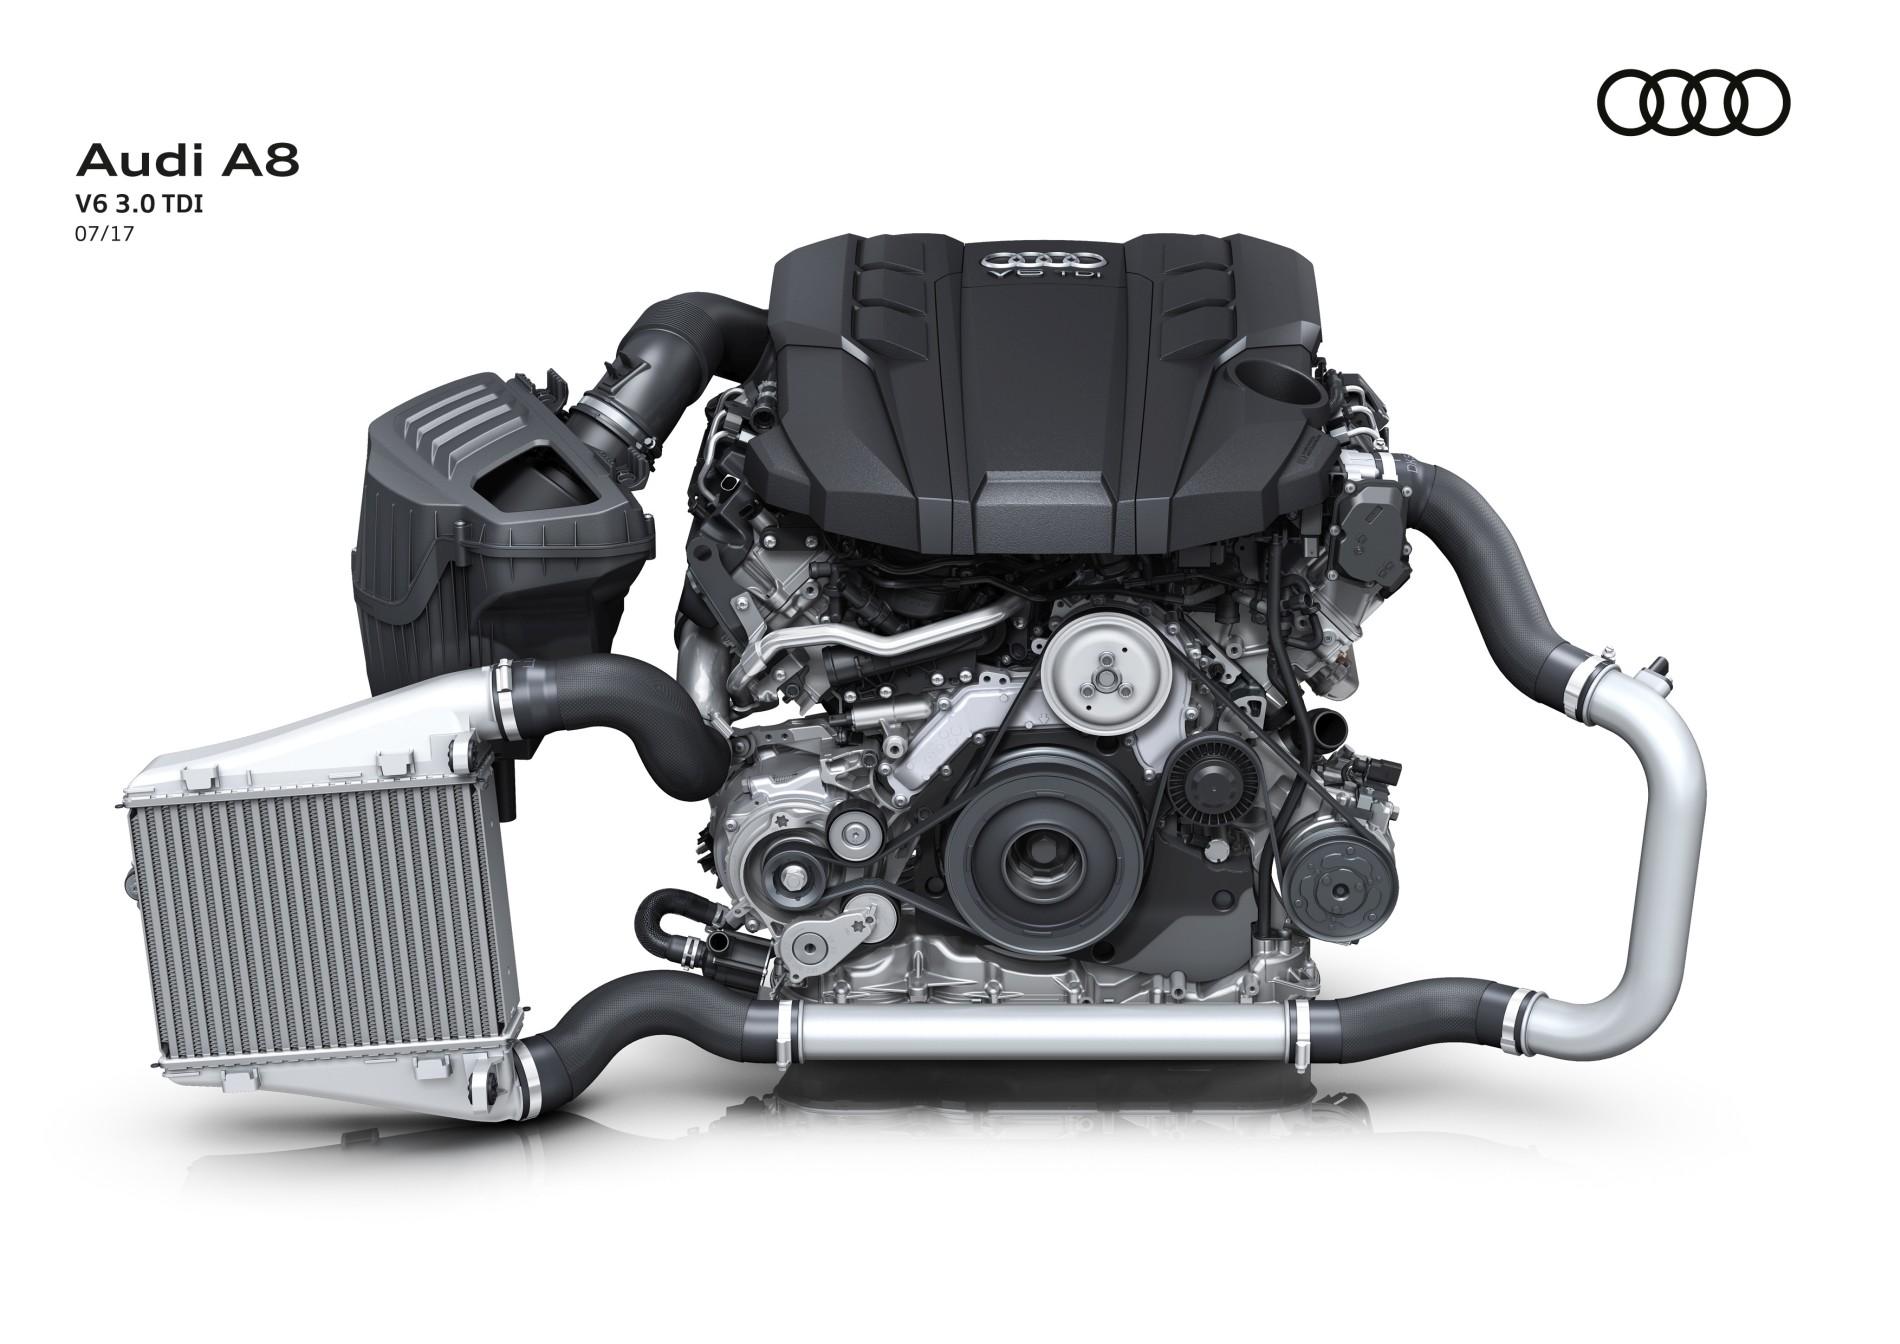 Audi A8 - V6 3.0 TDI